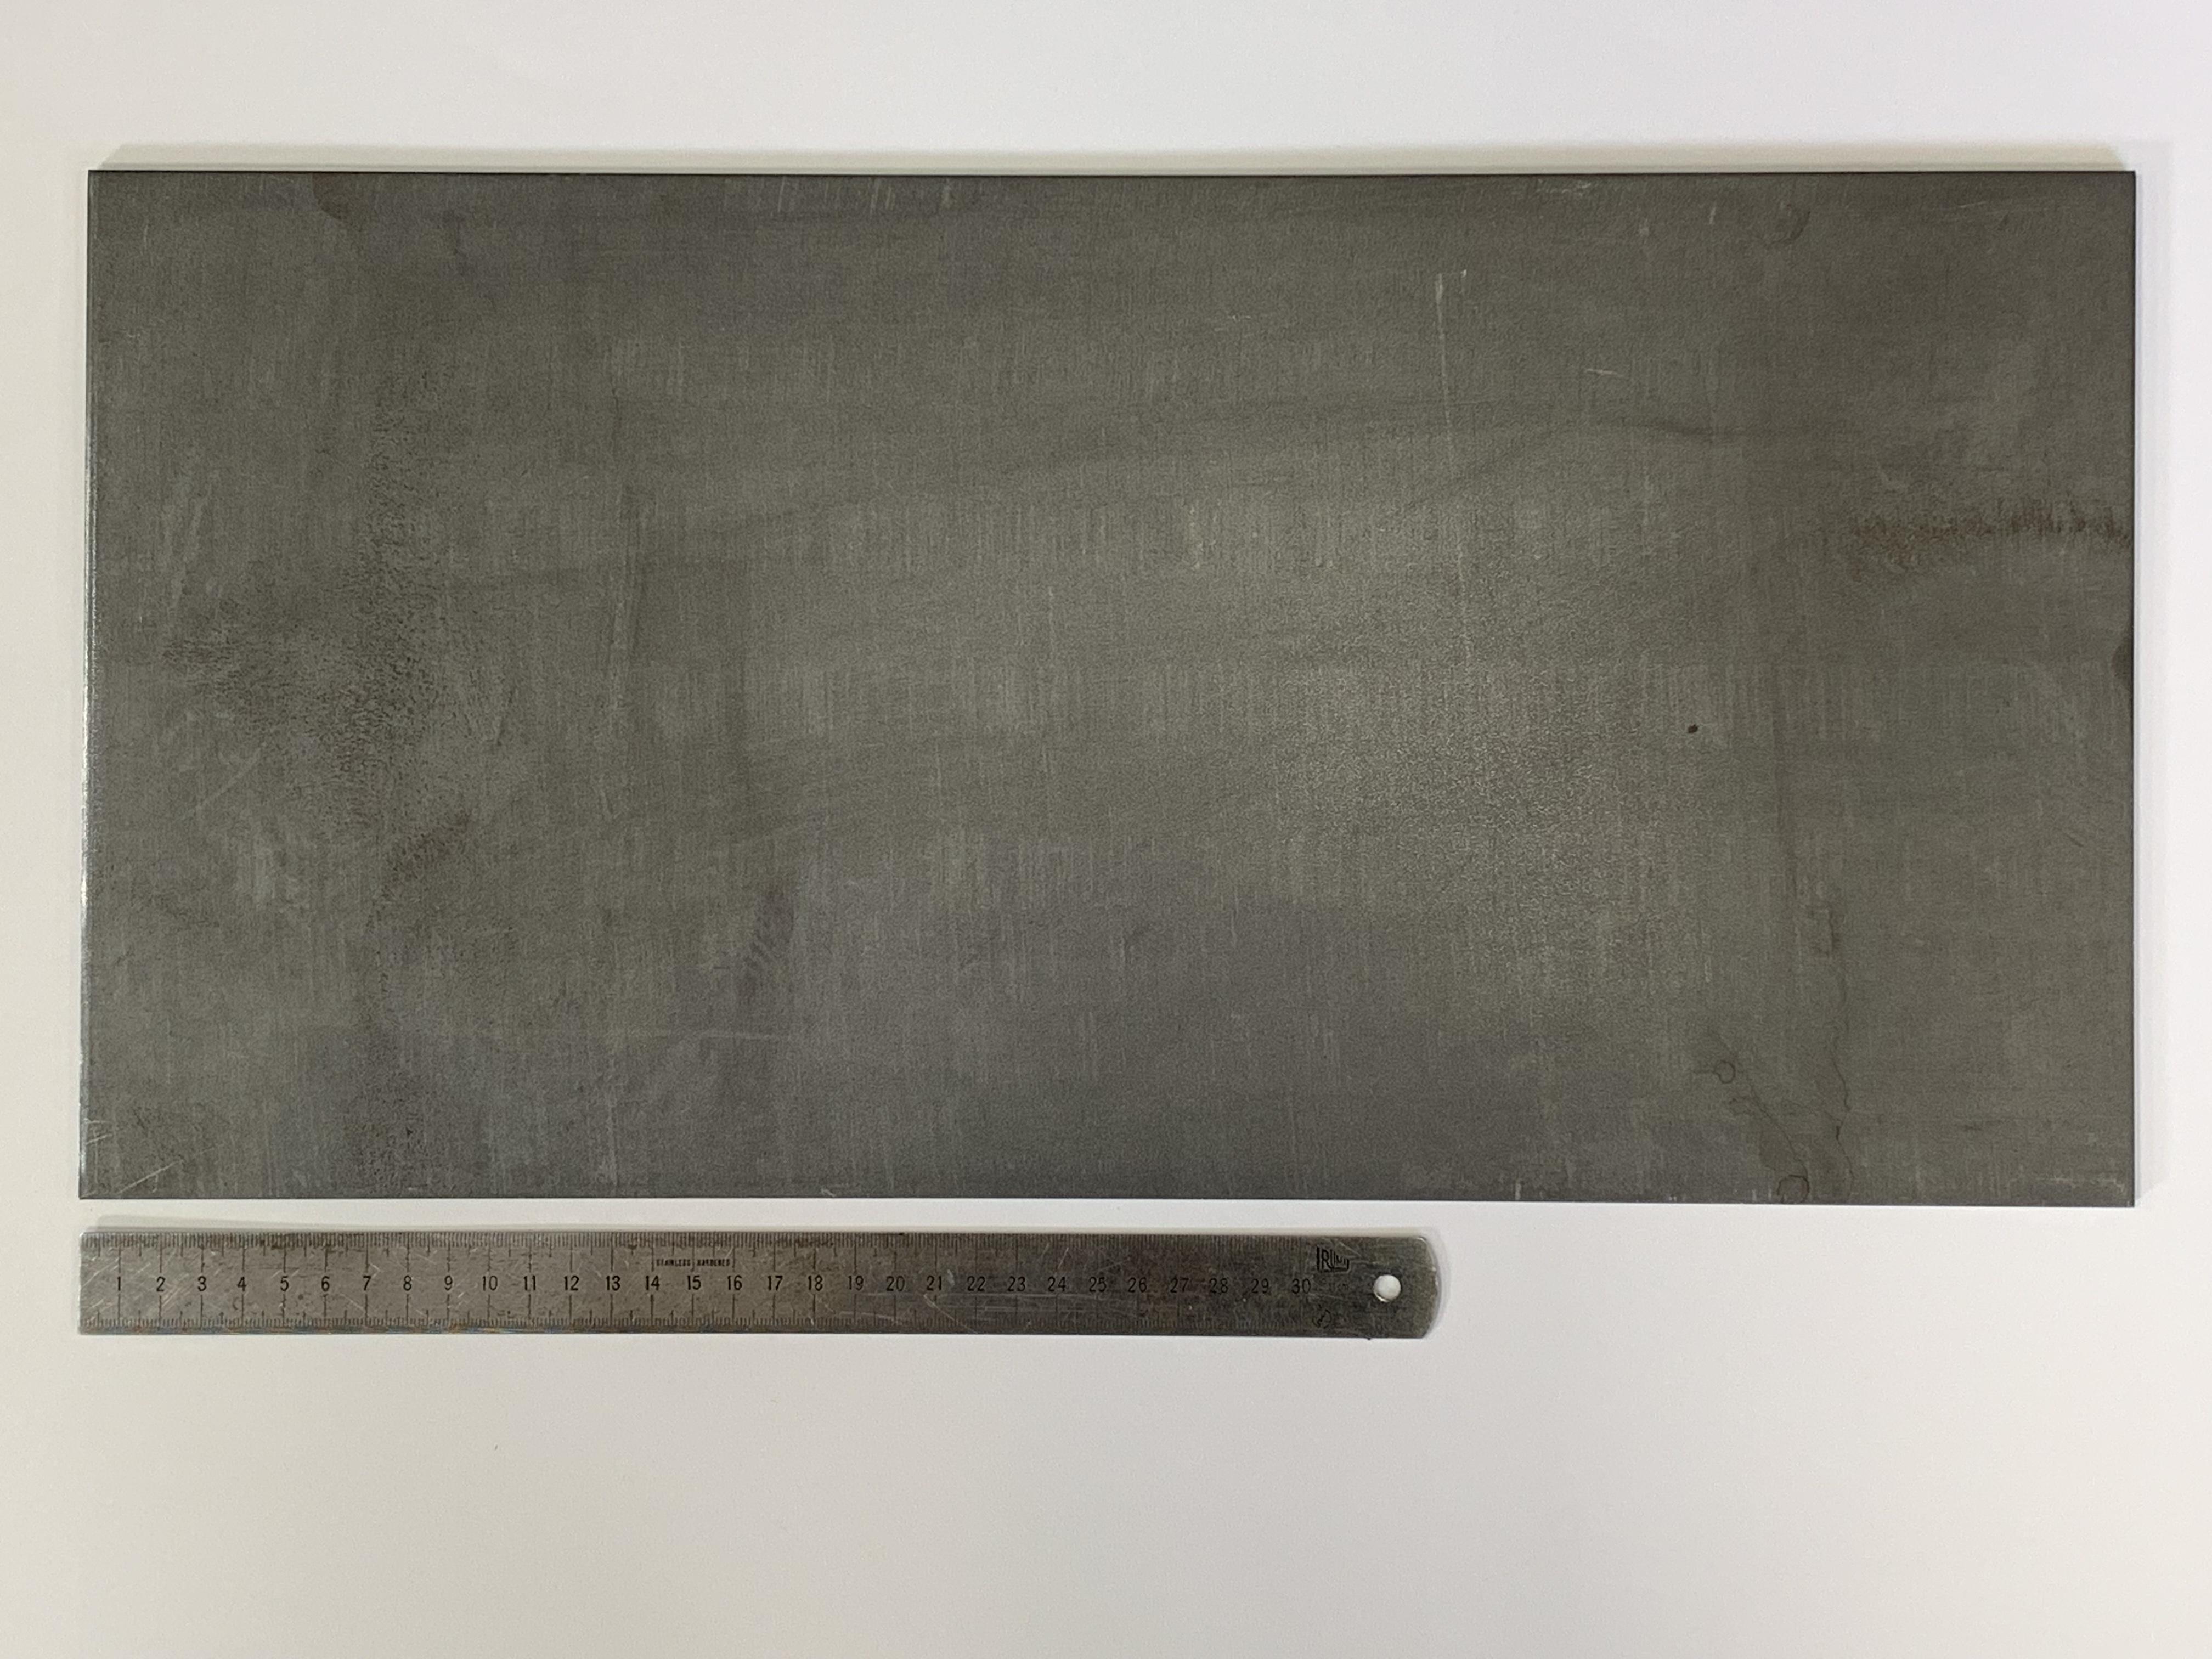 VG-10_4.2x250x500